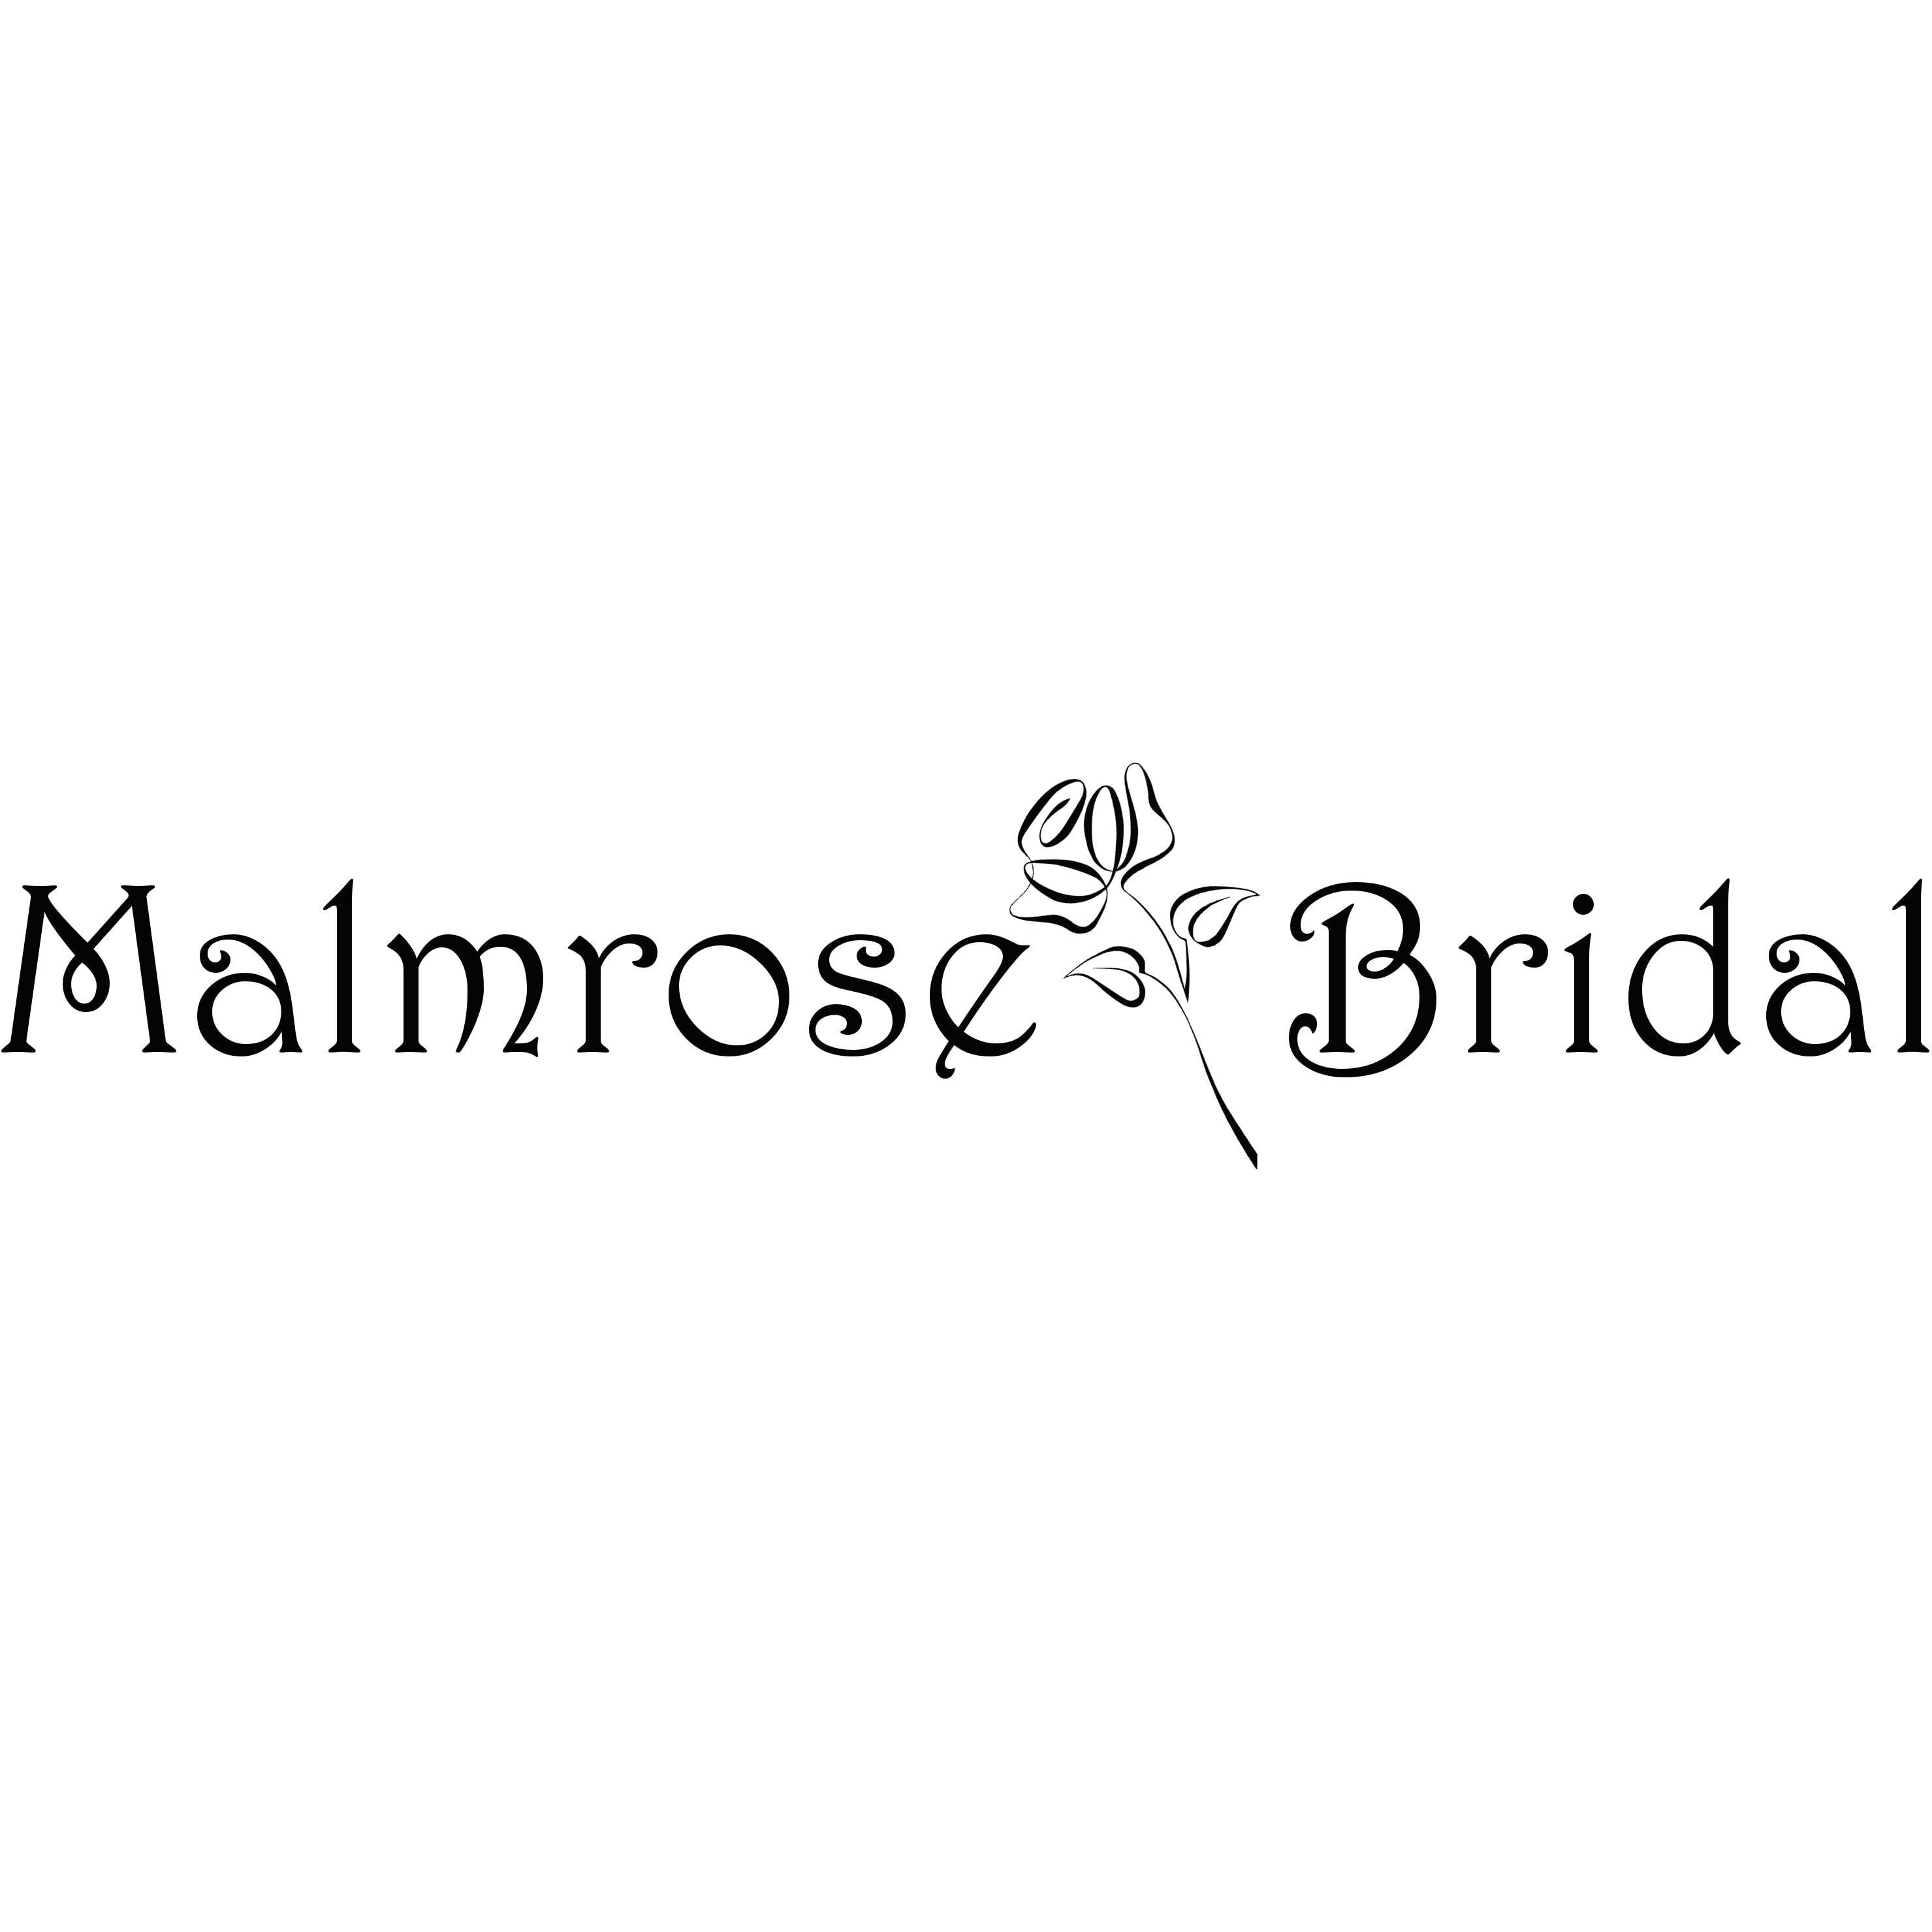 Malmrose Bridal - South Jordan, UT - Bridal Shops